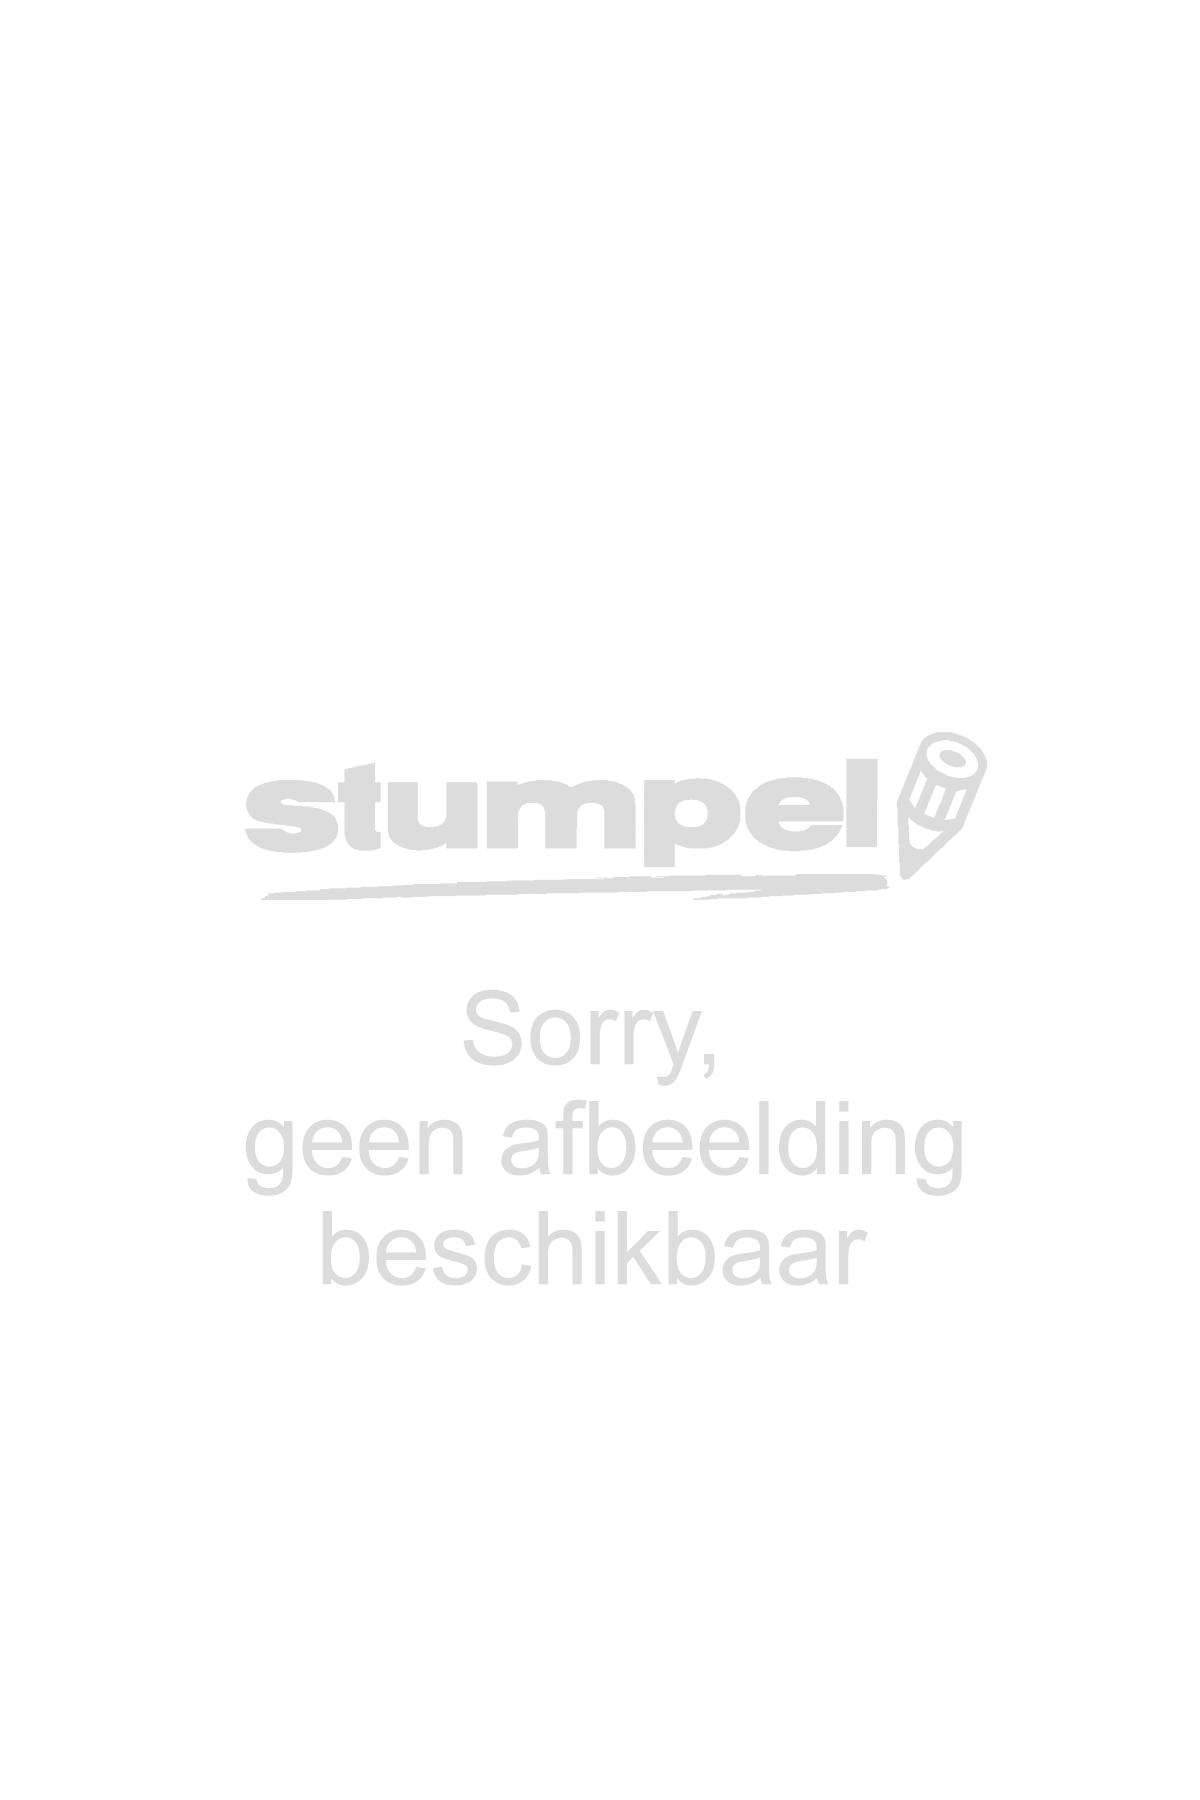 notitieboek-doodle-glitter-glamour-paperclip-10804412